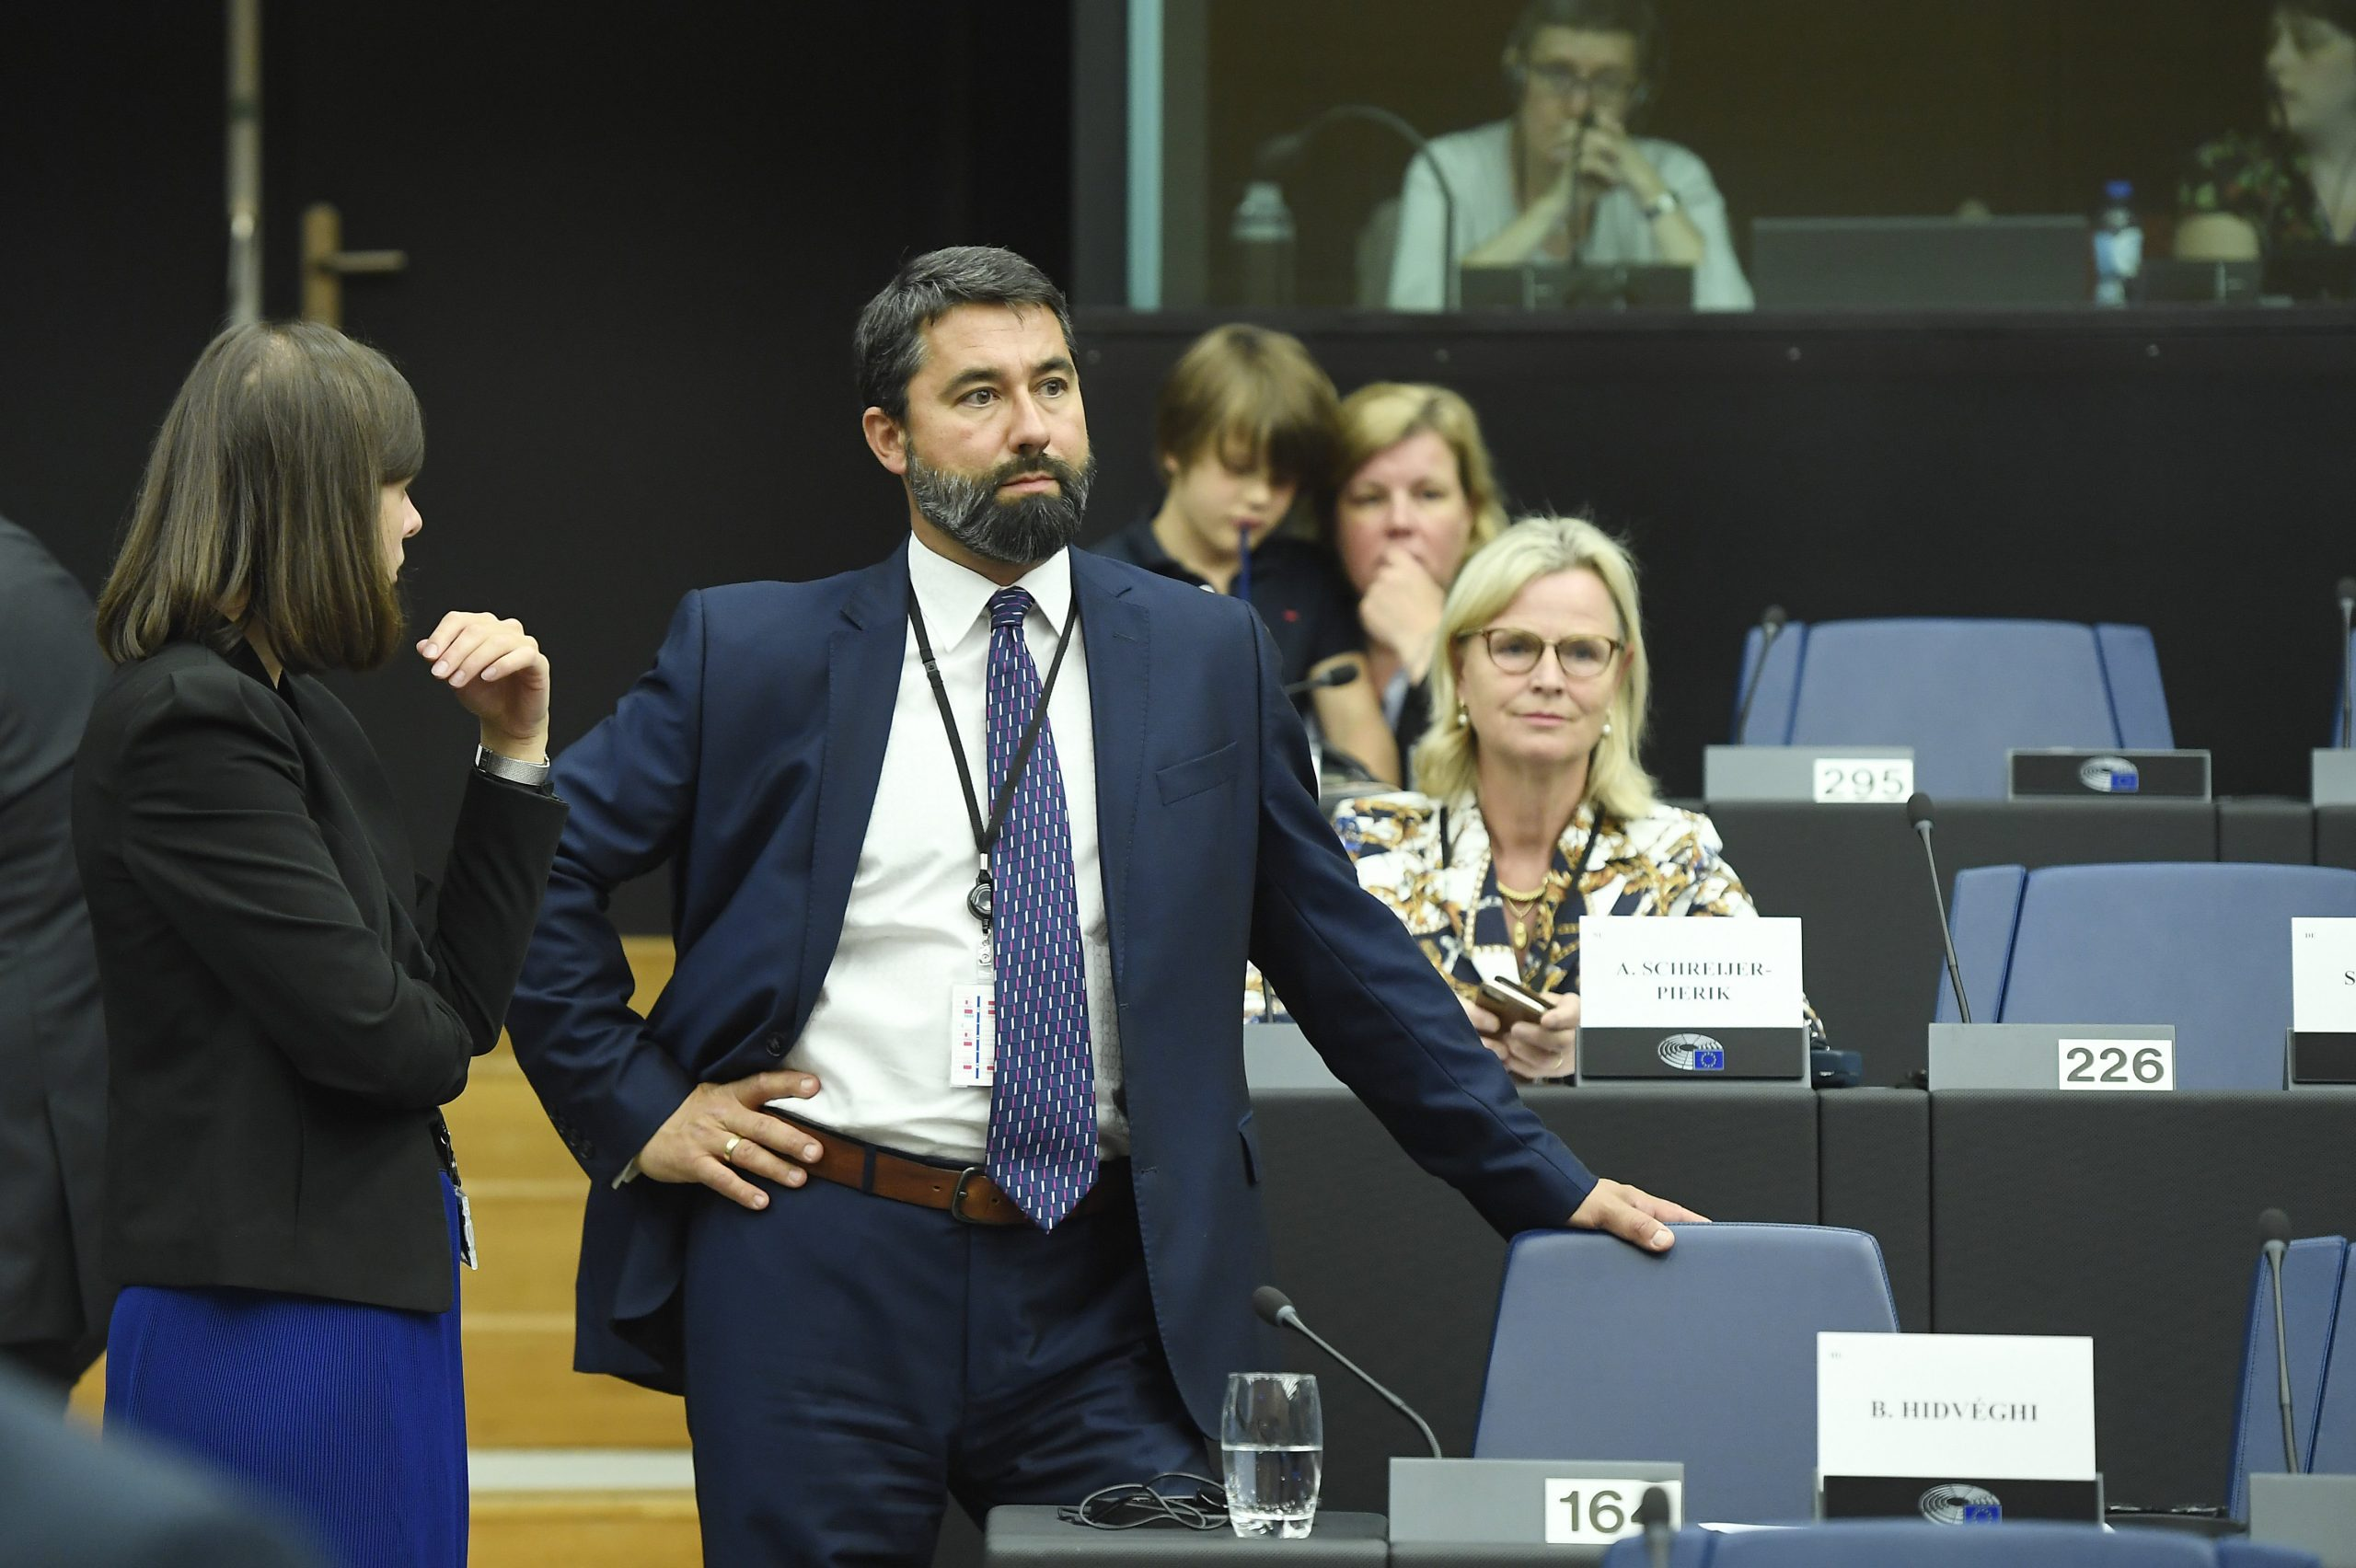 Fidesz MEP: EU Has No Need for Labour Migration Rules